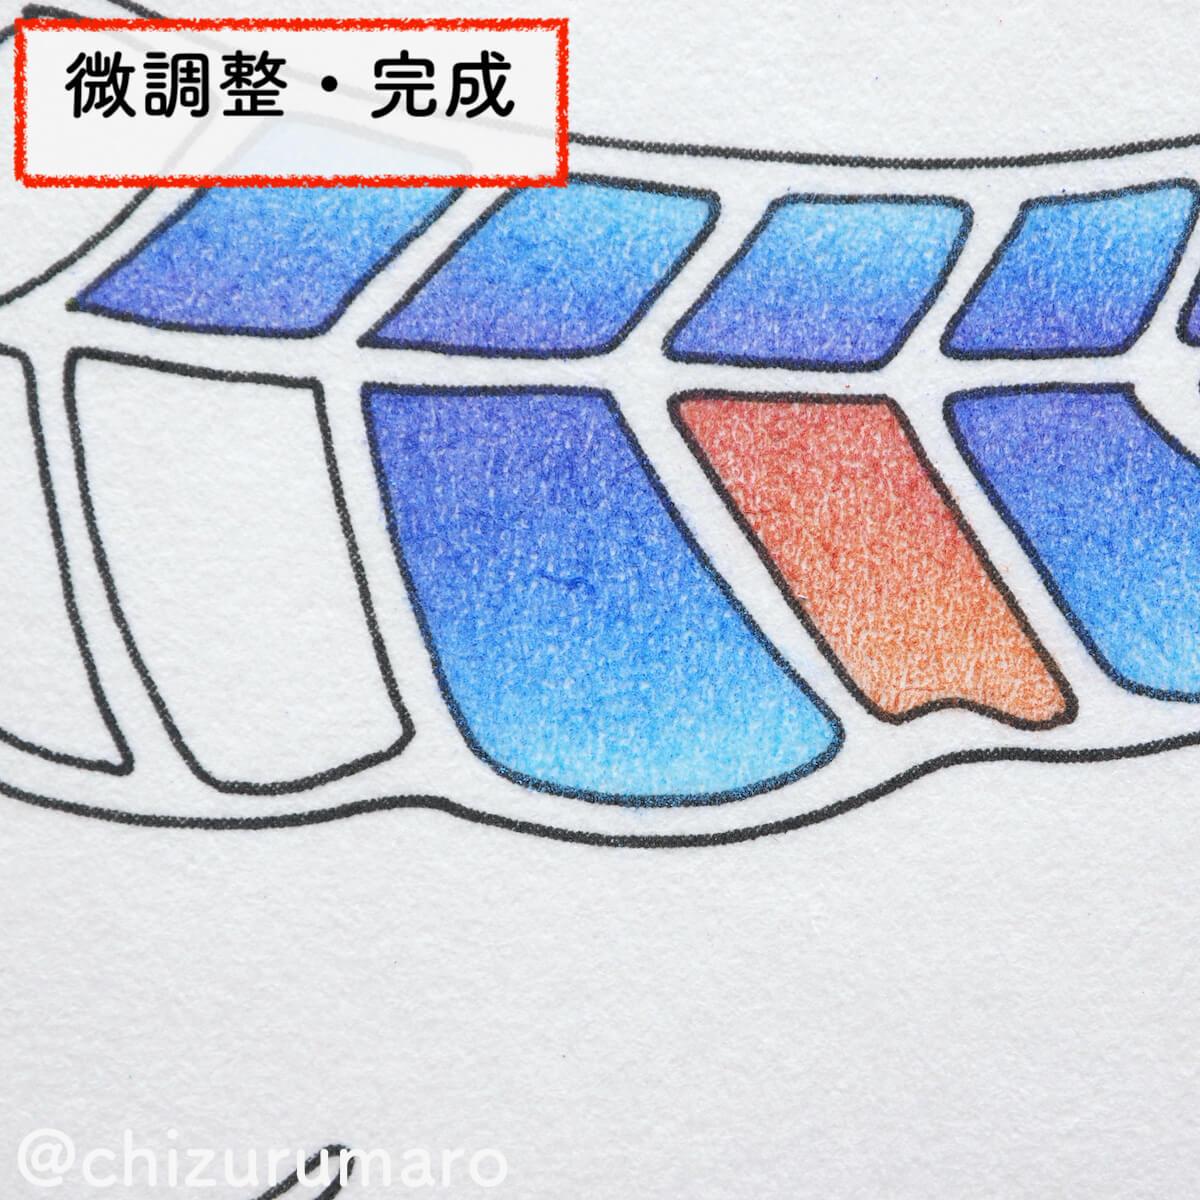 f:id:chizurumaro:20200609144108j:plain